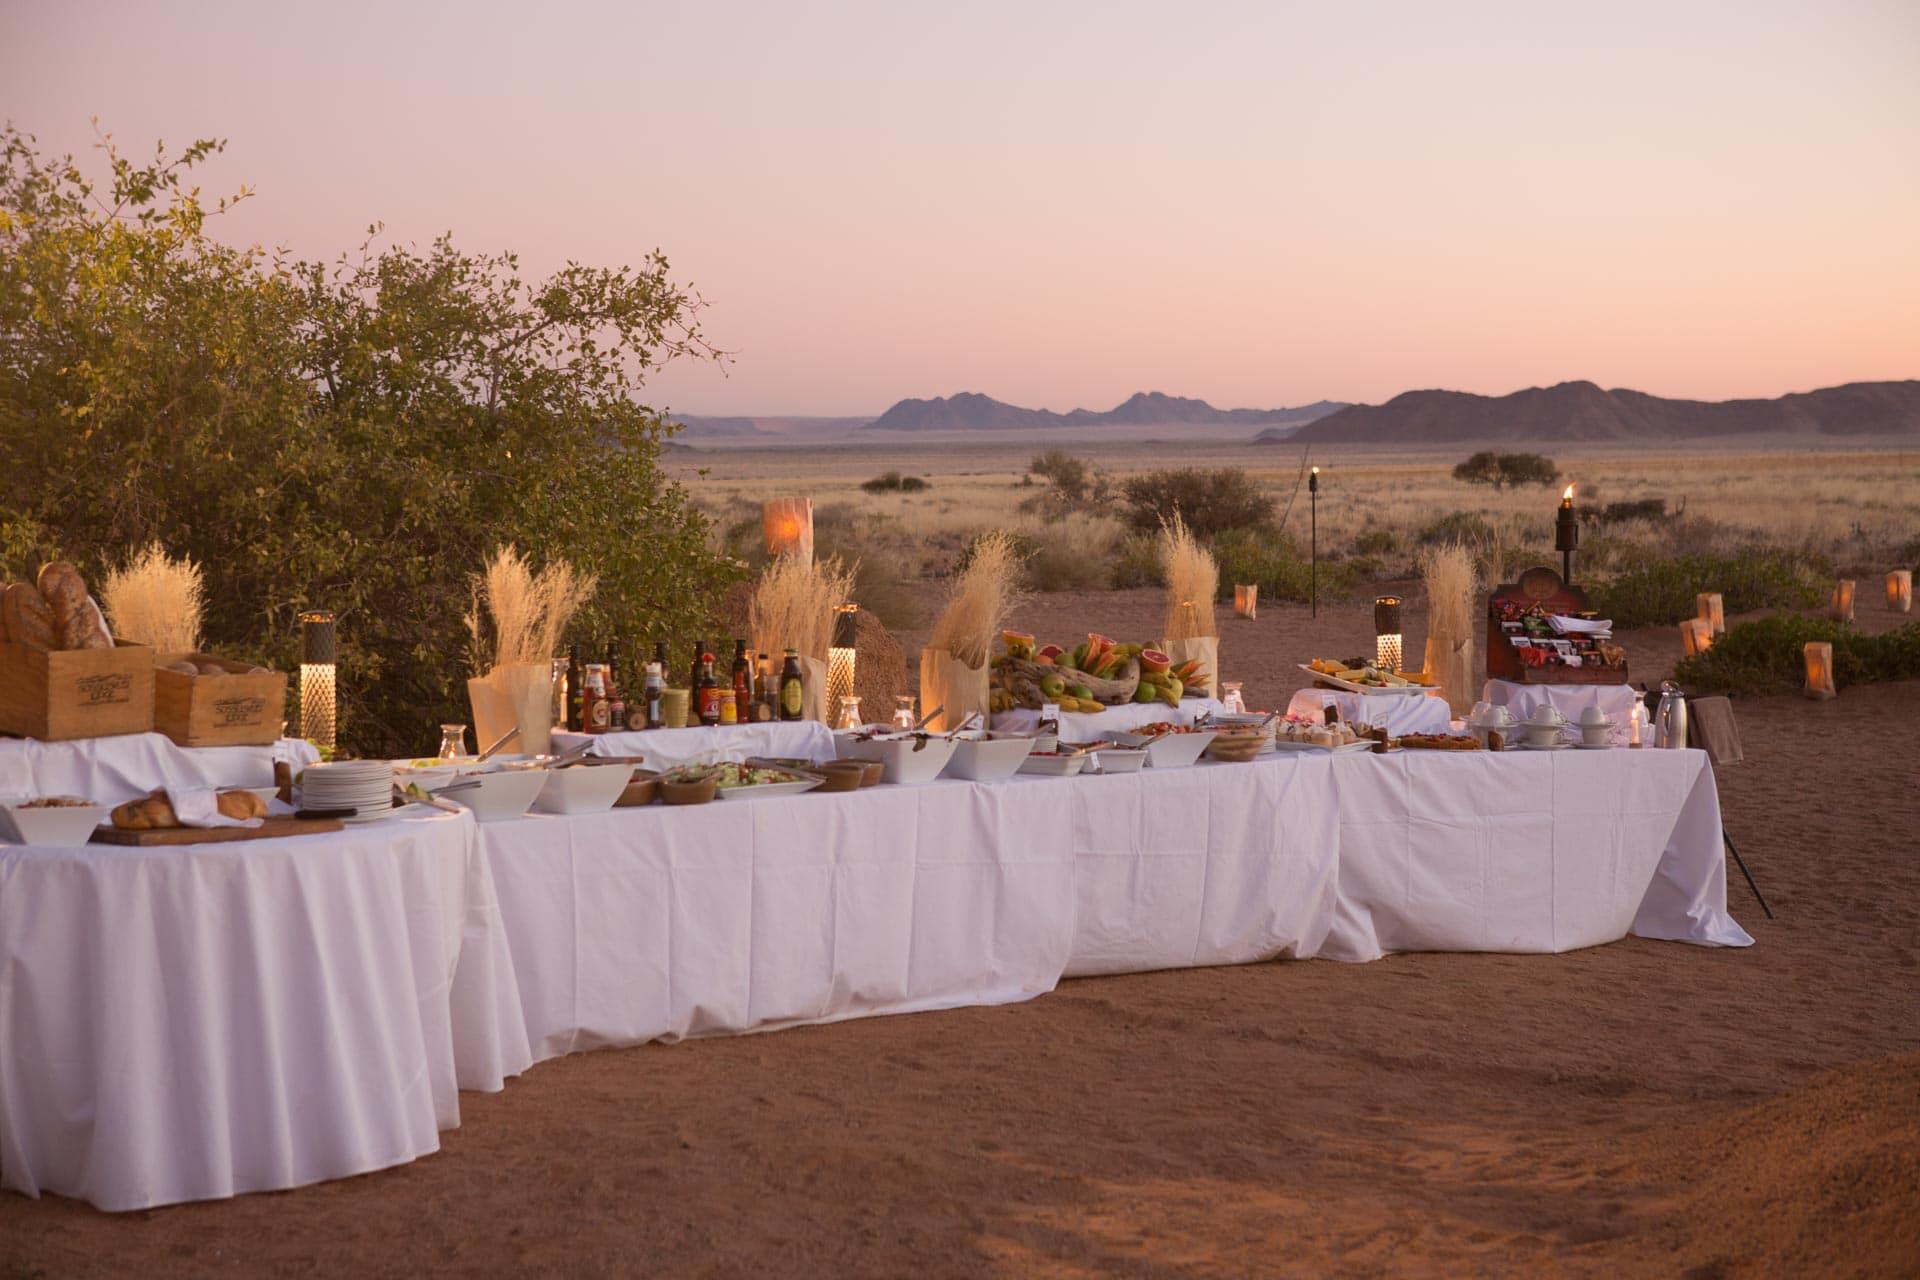 Adventure-Center-Sossusvlei-Lodge-Namibia-28